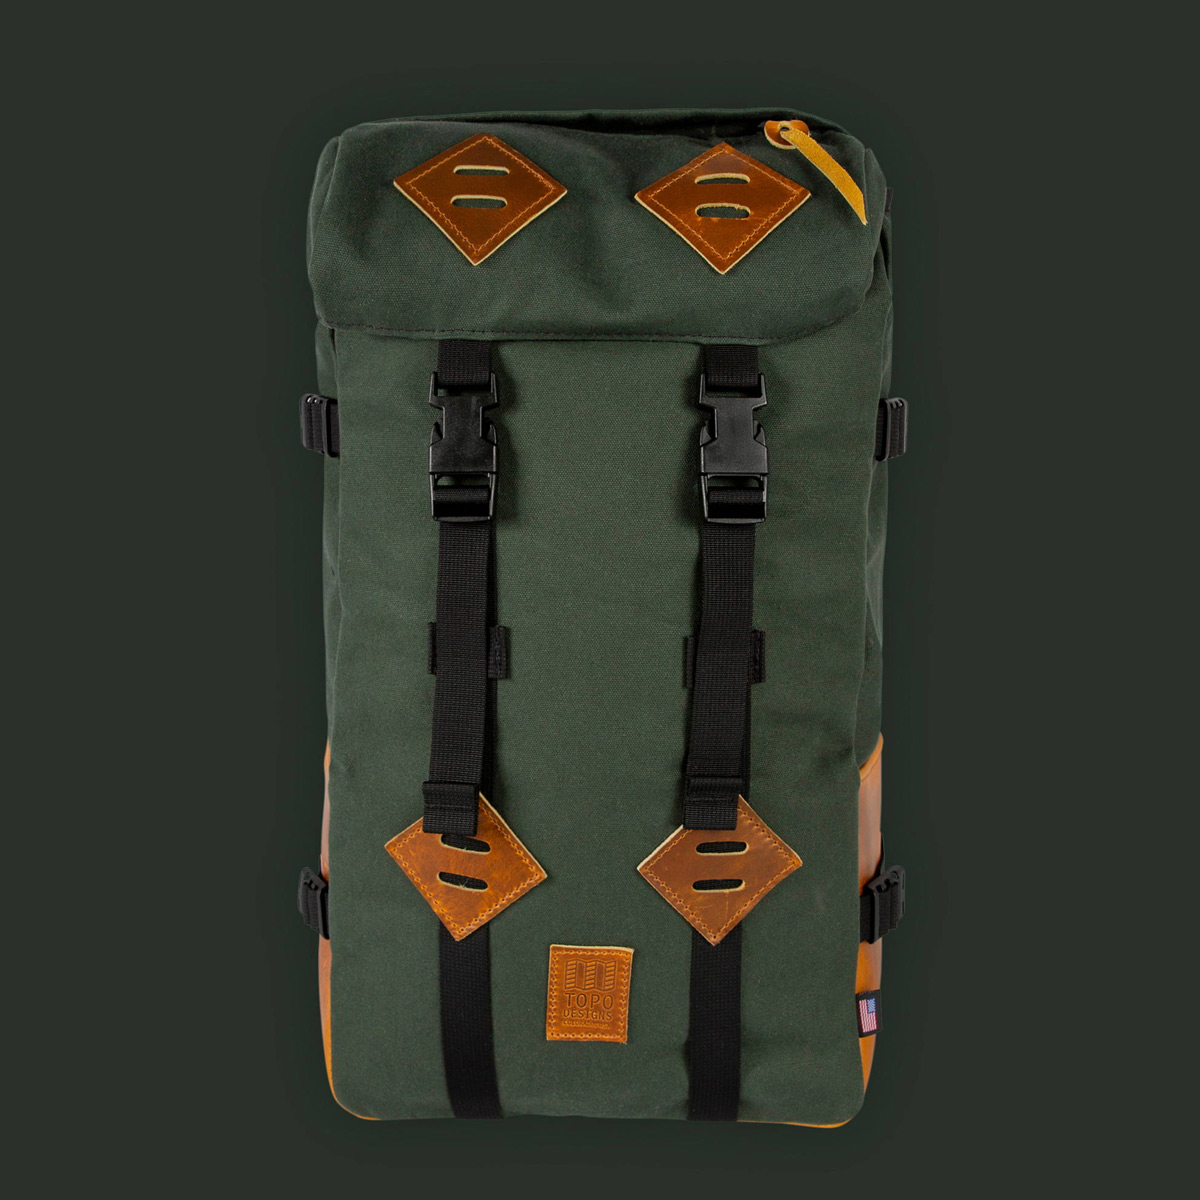 Topo Designs Klettersack Heritage Olive Canvas/Brown Leather, prachtige rugzak voor mannen en vrouwen